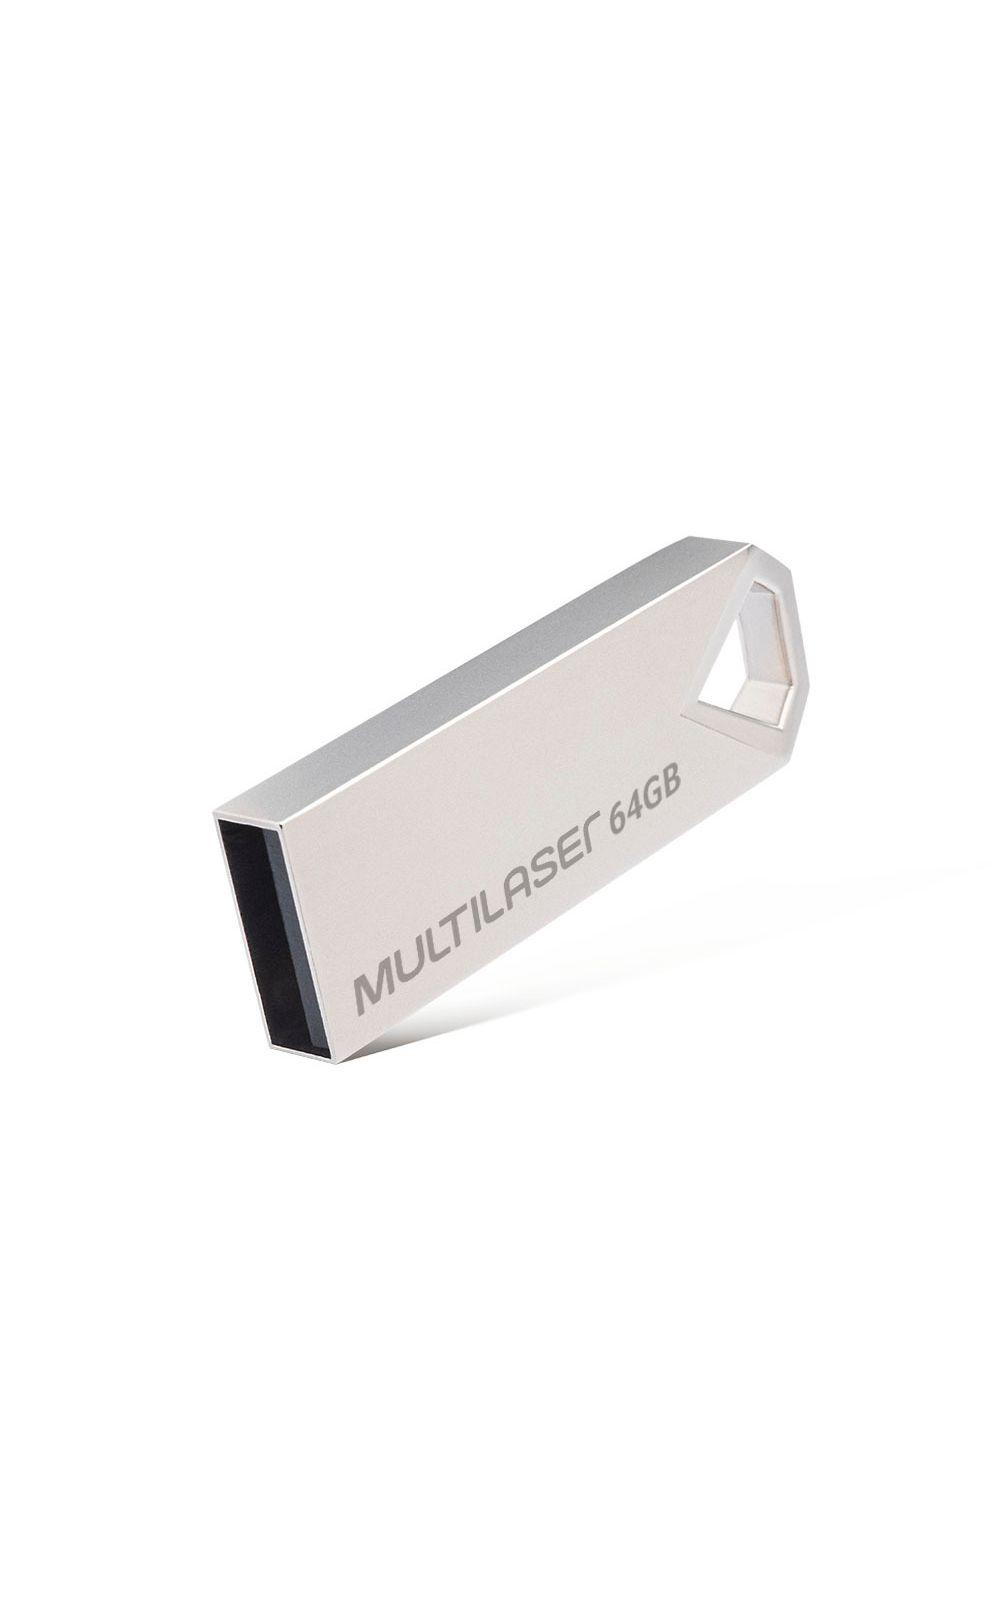 Foto 2 - Pendrive Multilaser Diamond 64GB USB 2.0 Metálico - PD852